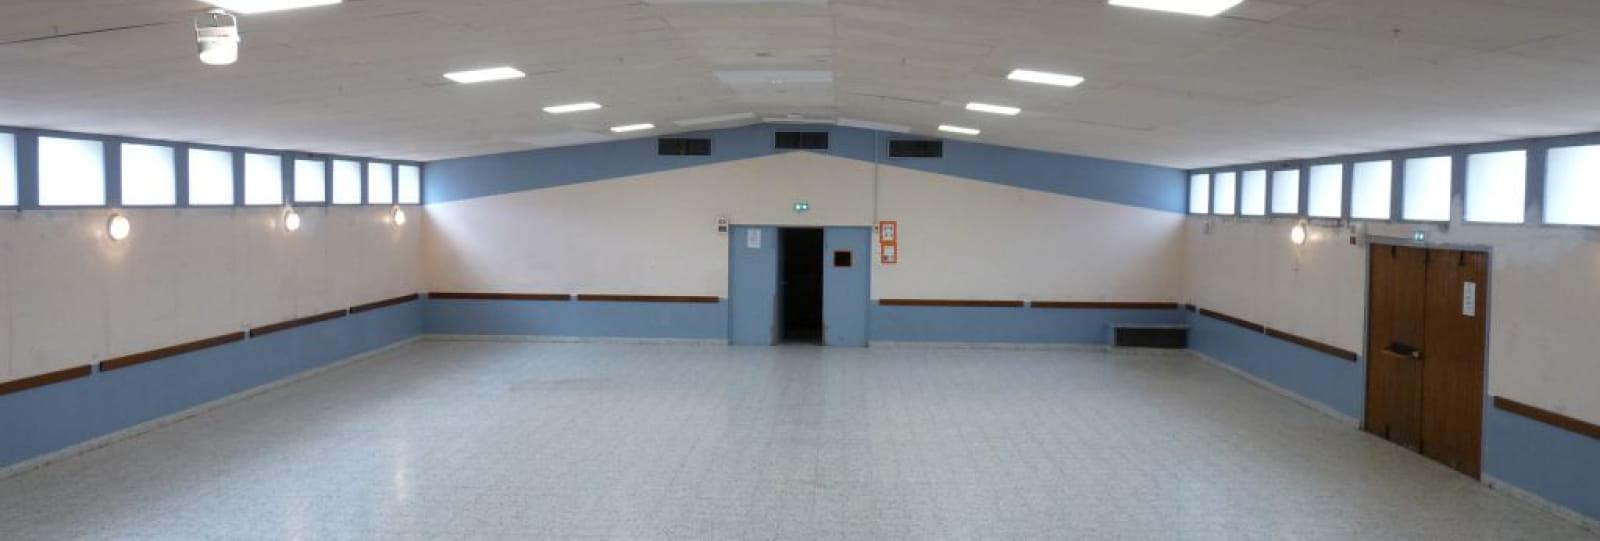 Salle des fêtes communale